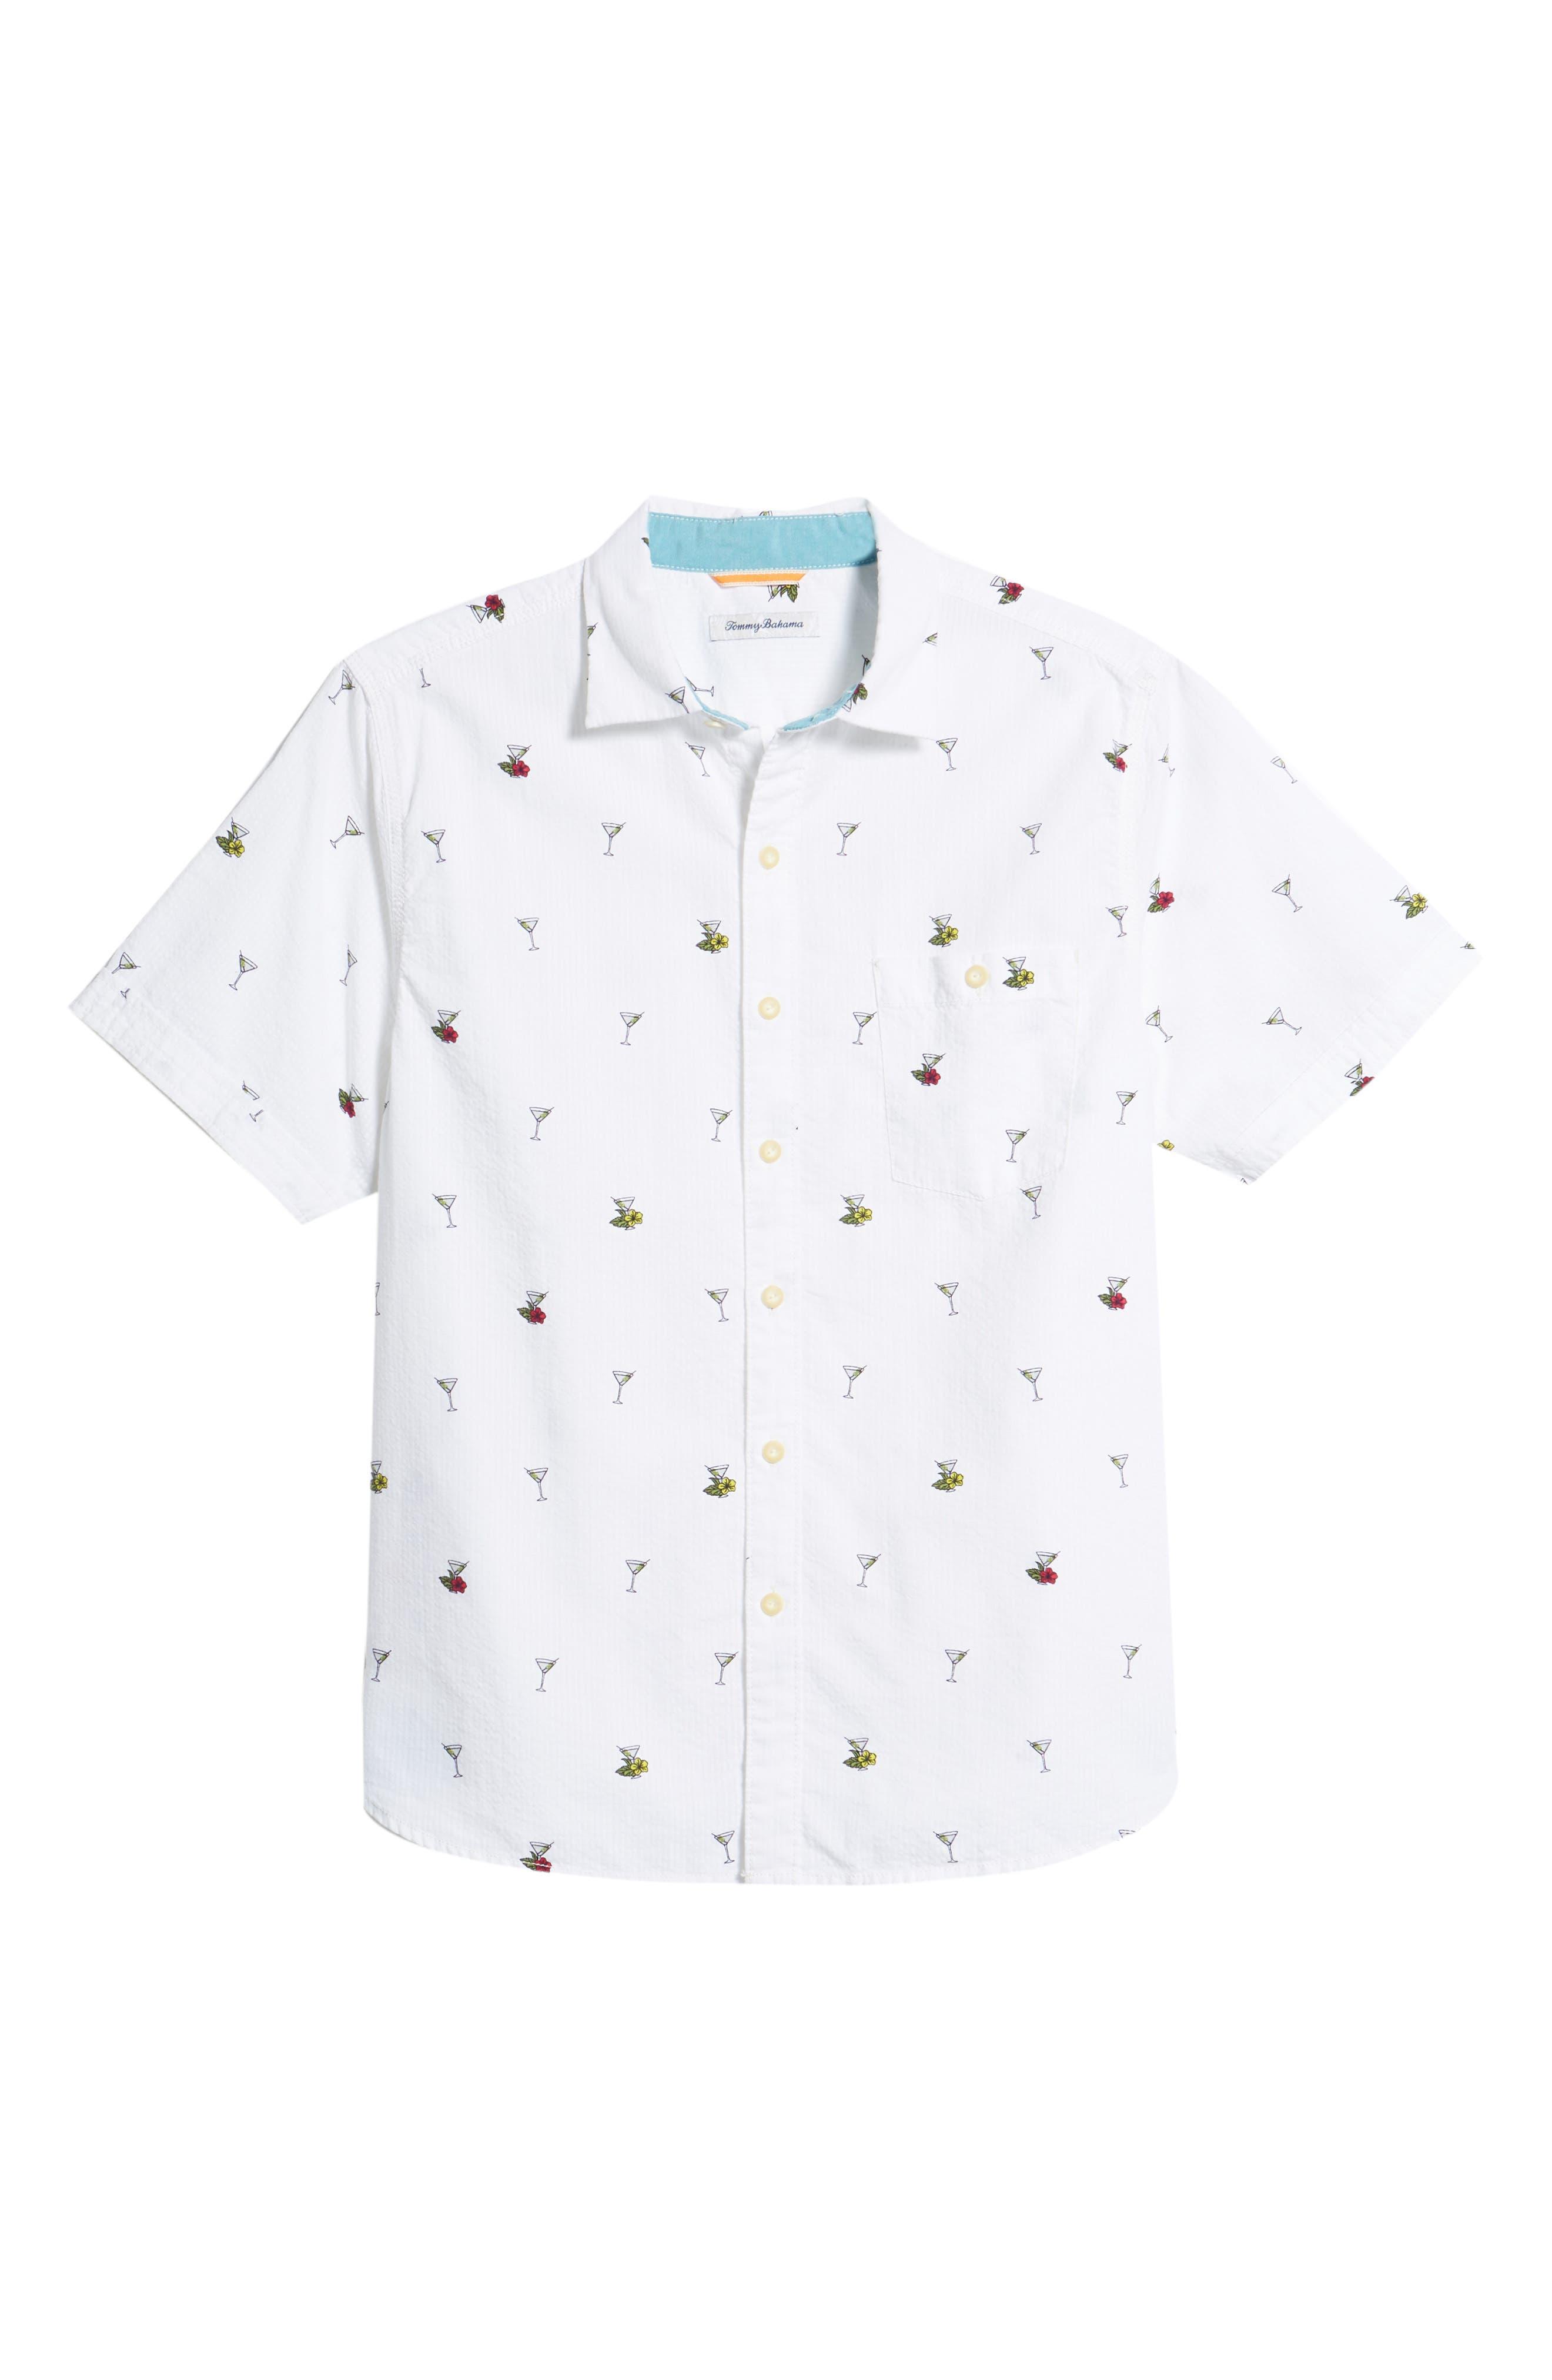 Mix Master Seersucker Shirt,                             Alternate thumbnail 6, color,                             Continental